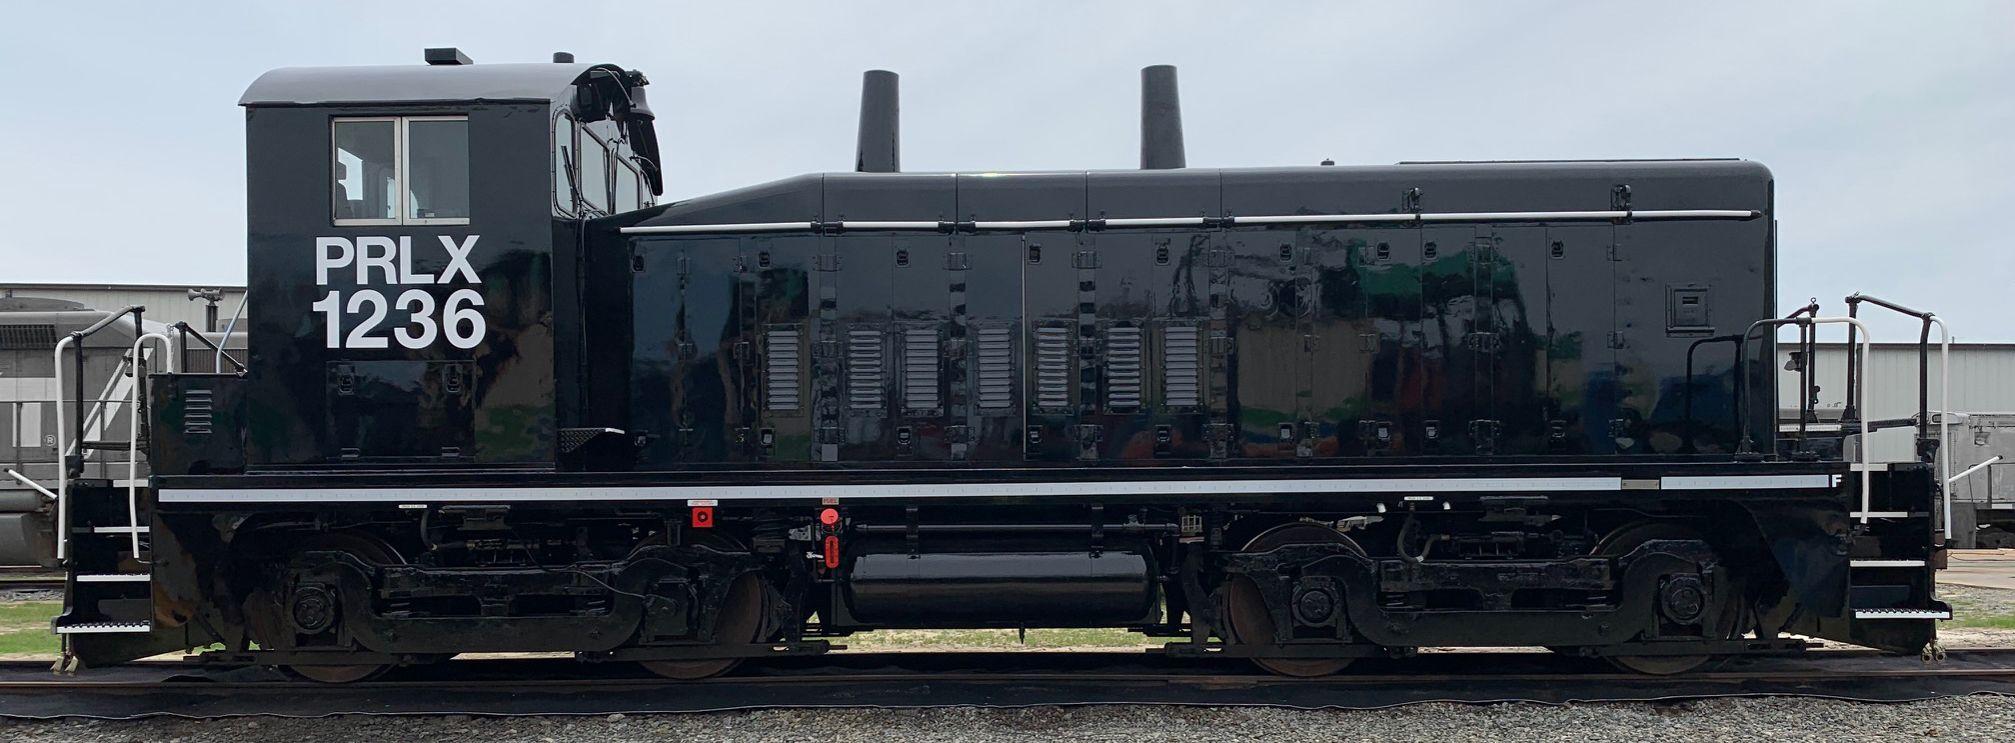 Locomotive Leasing